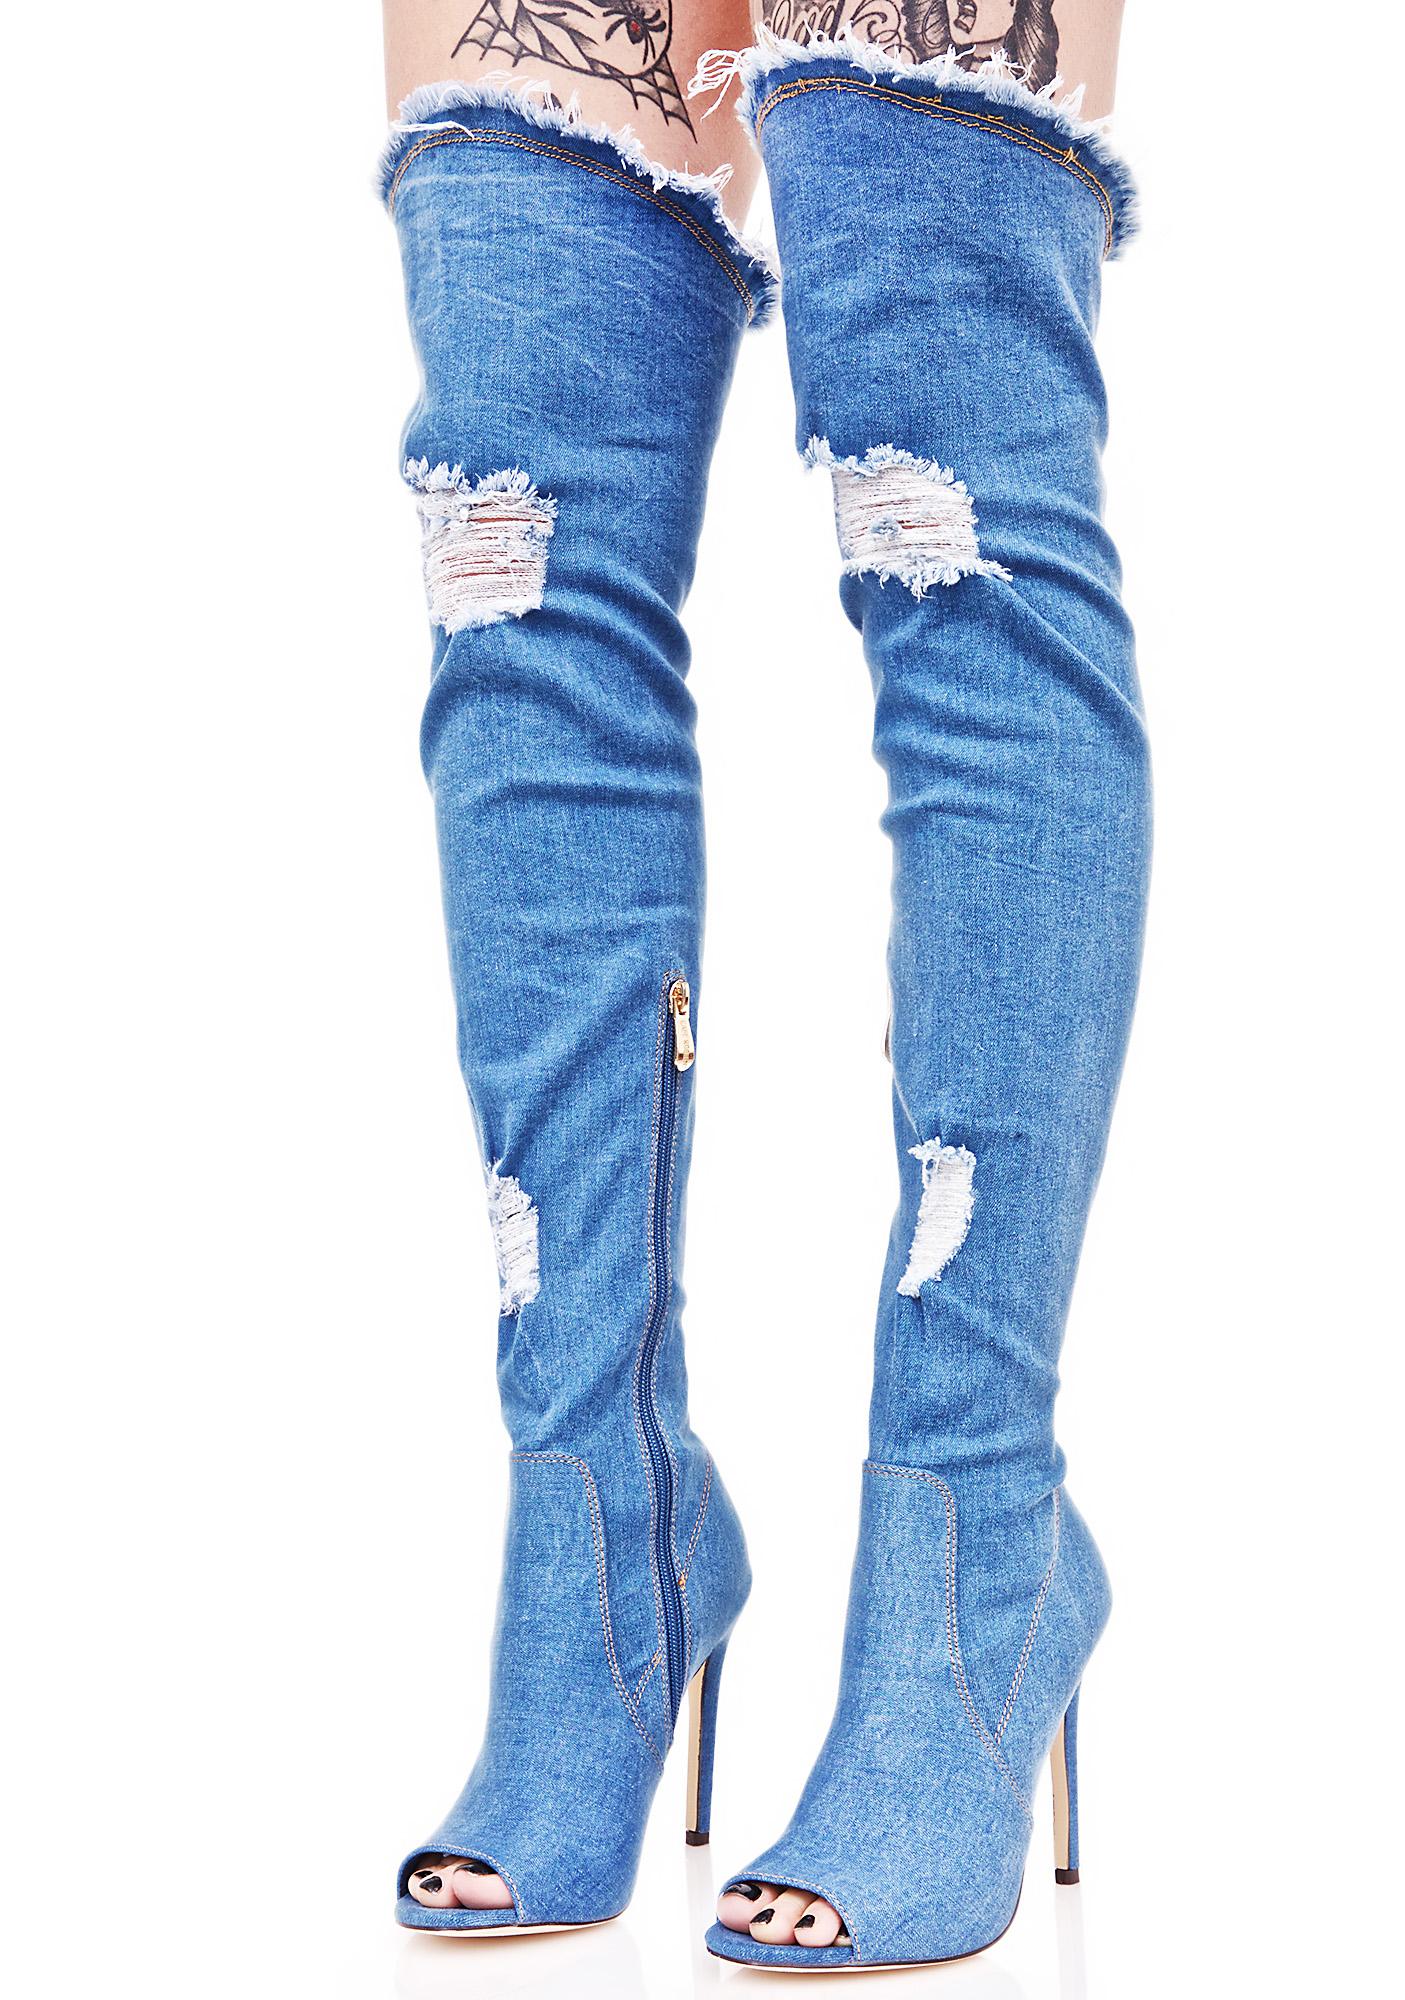 Denim Distressed Thigh Boots